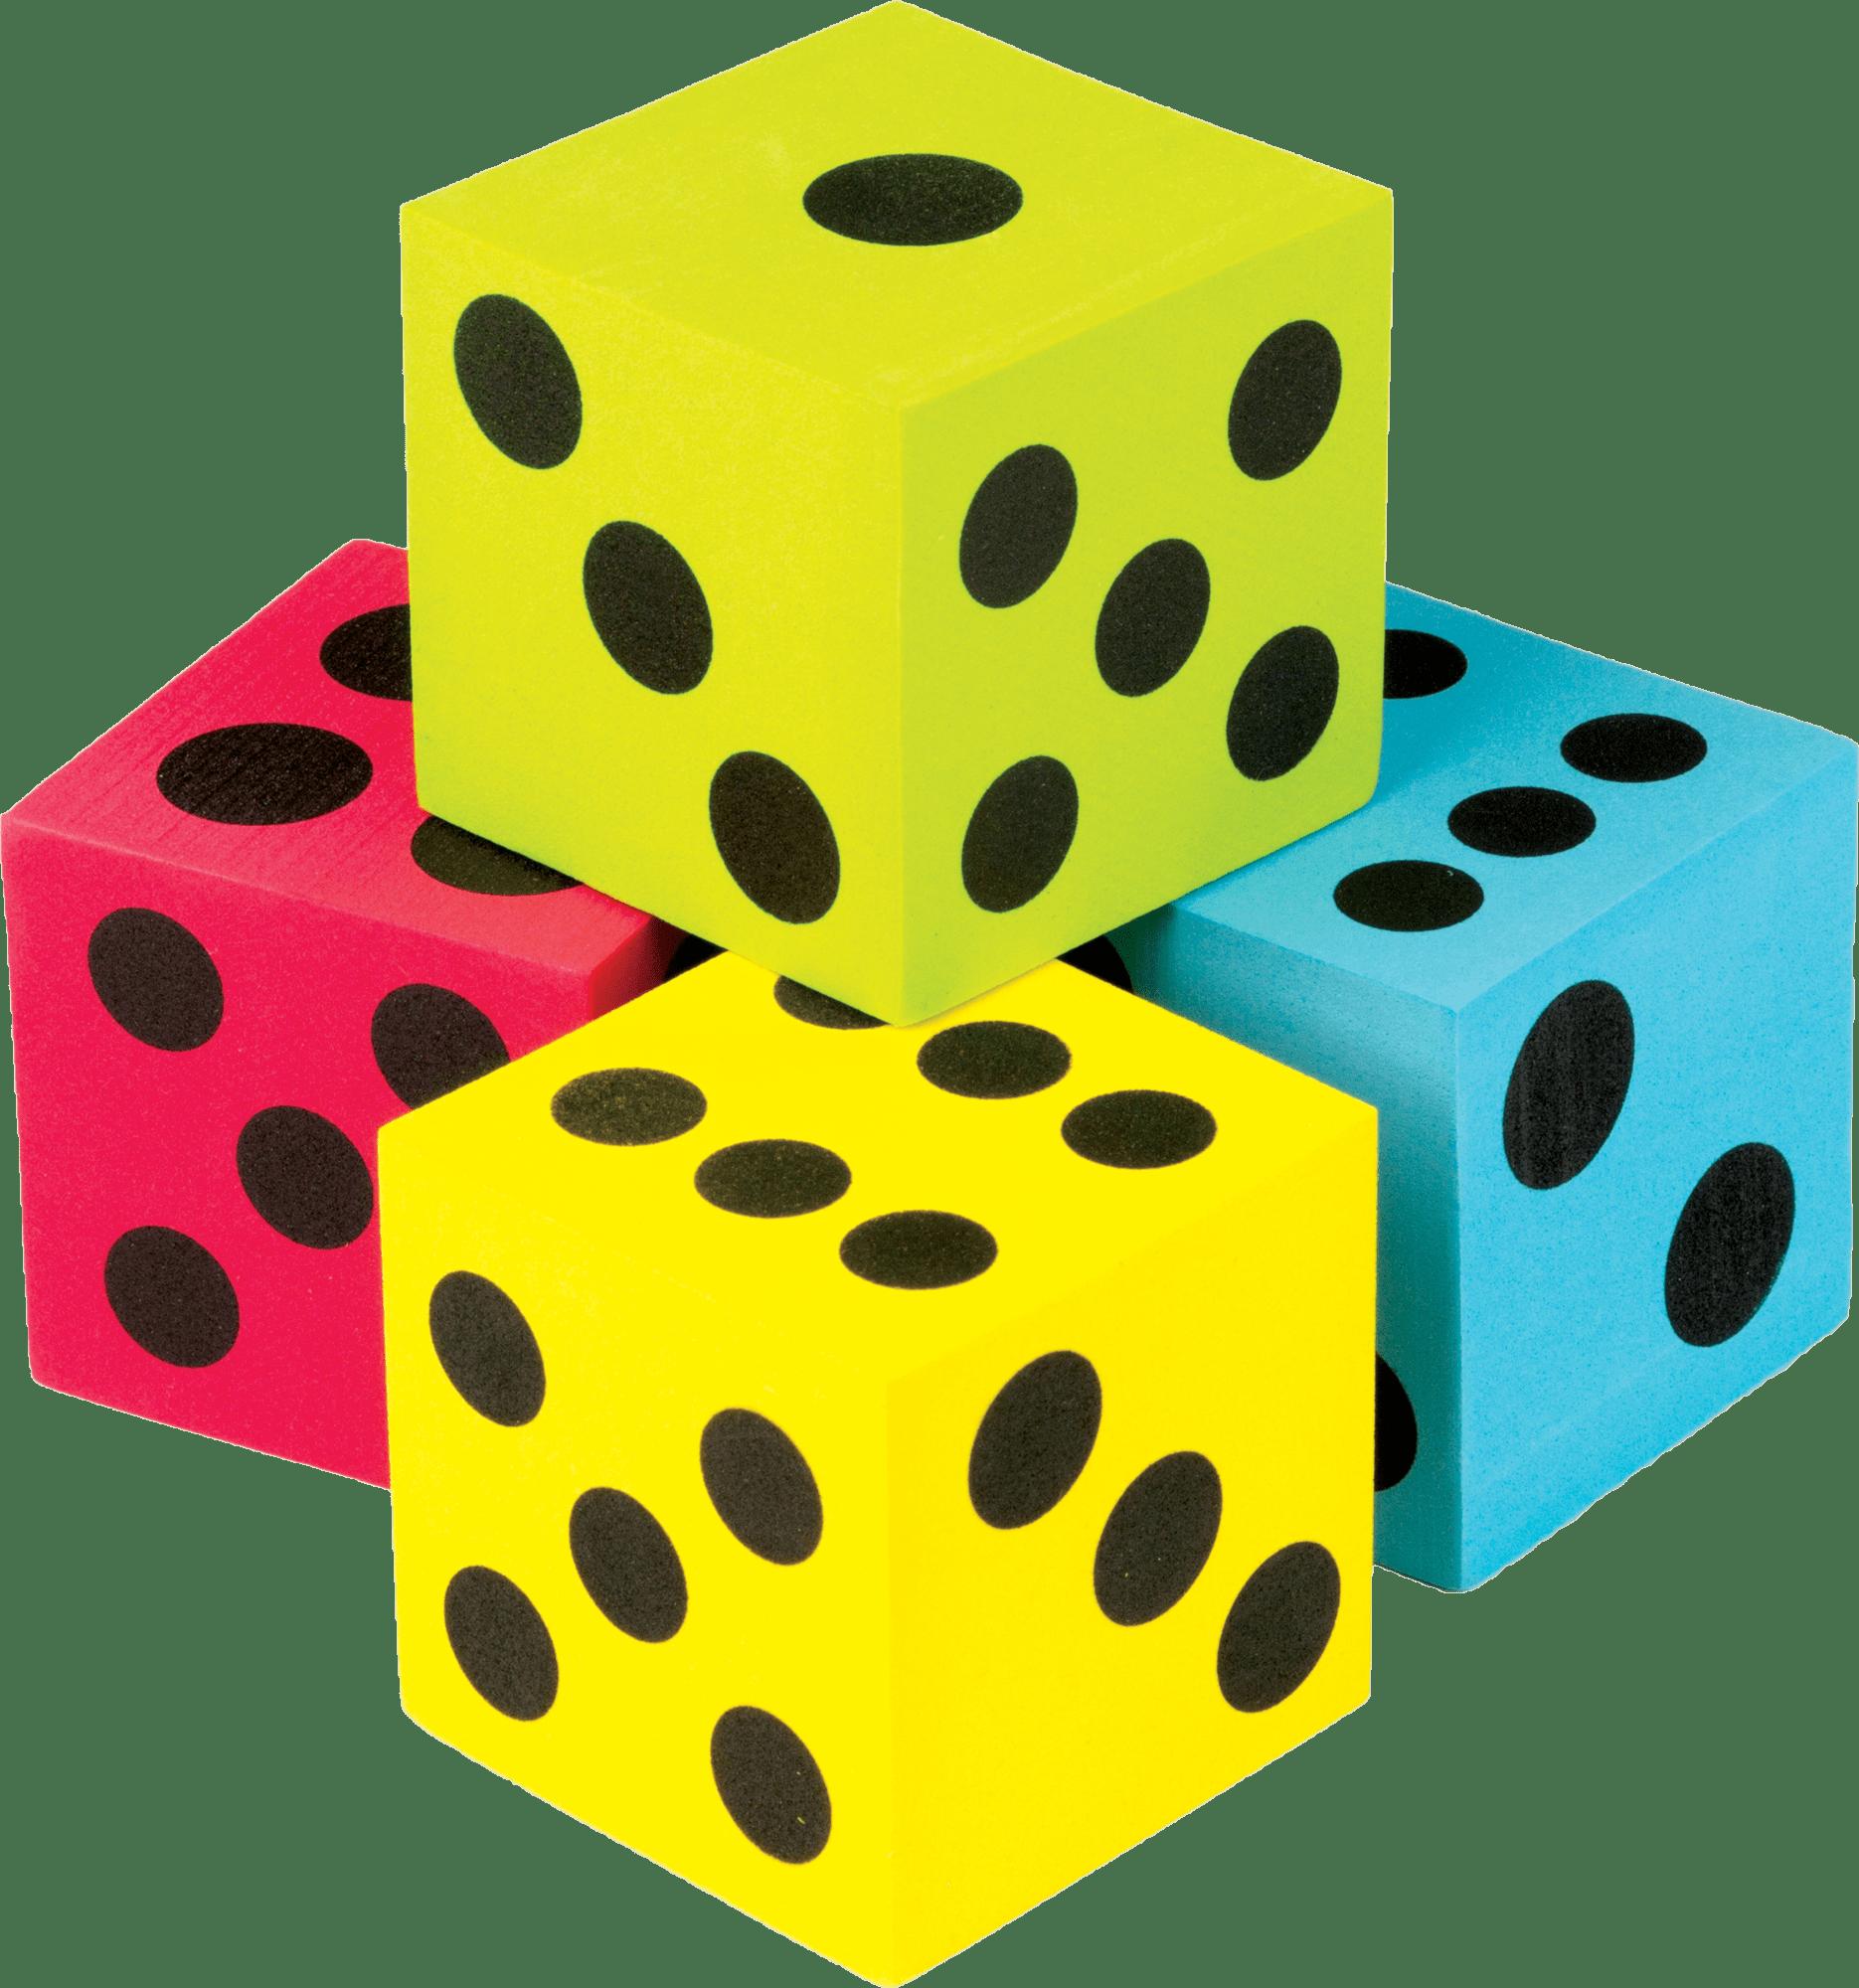 Colorful Jumbo Dice 4 Pack